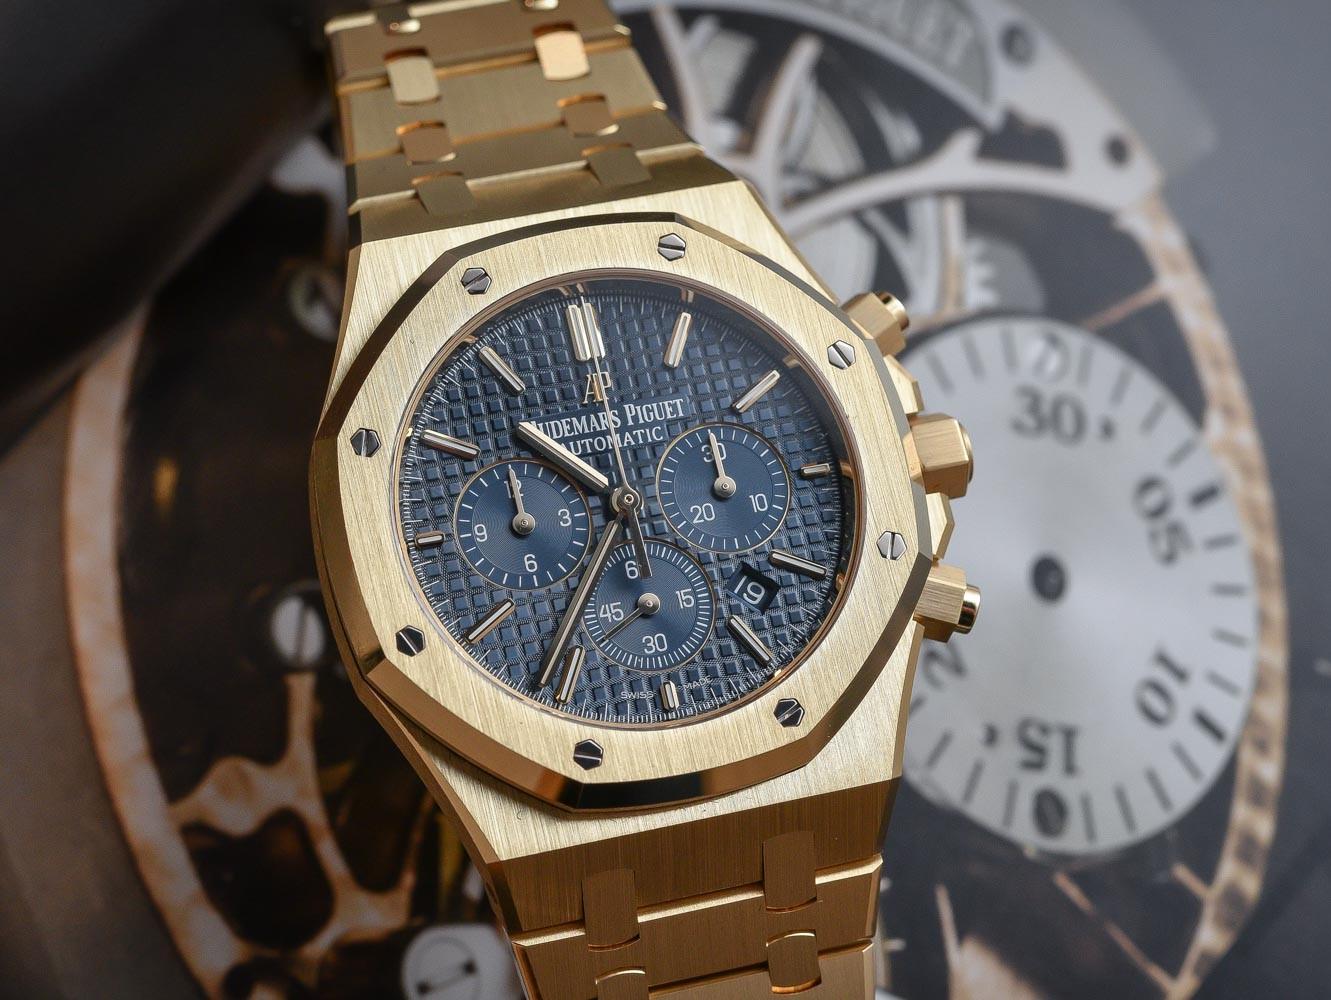 audemars-piguet-royal-oak-chronograph-26320-yellow-gold- 137f70c459